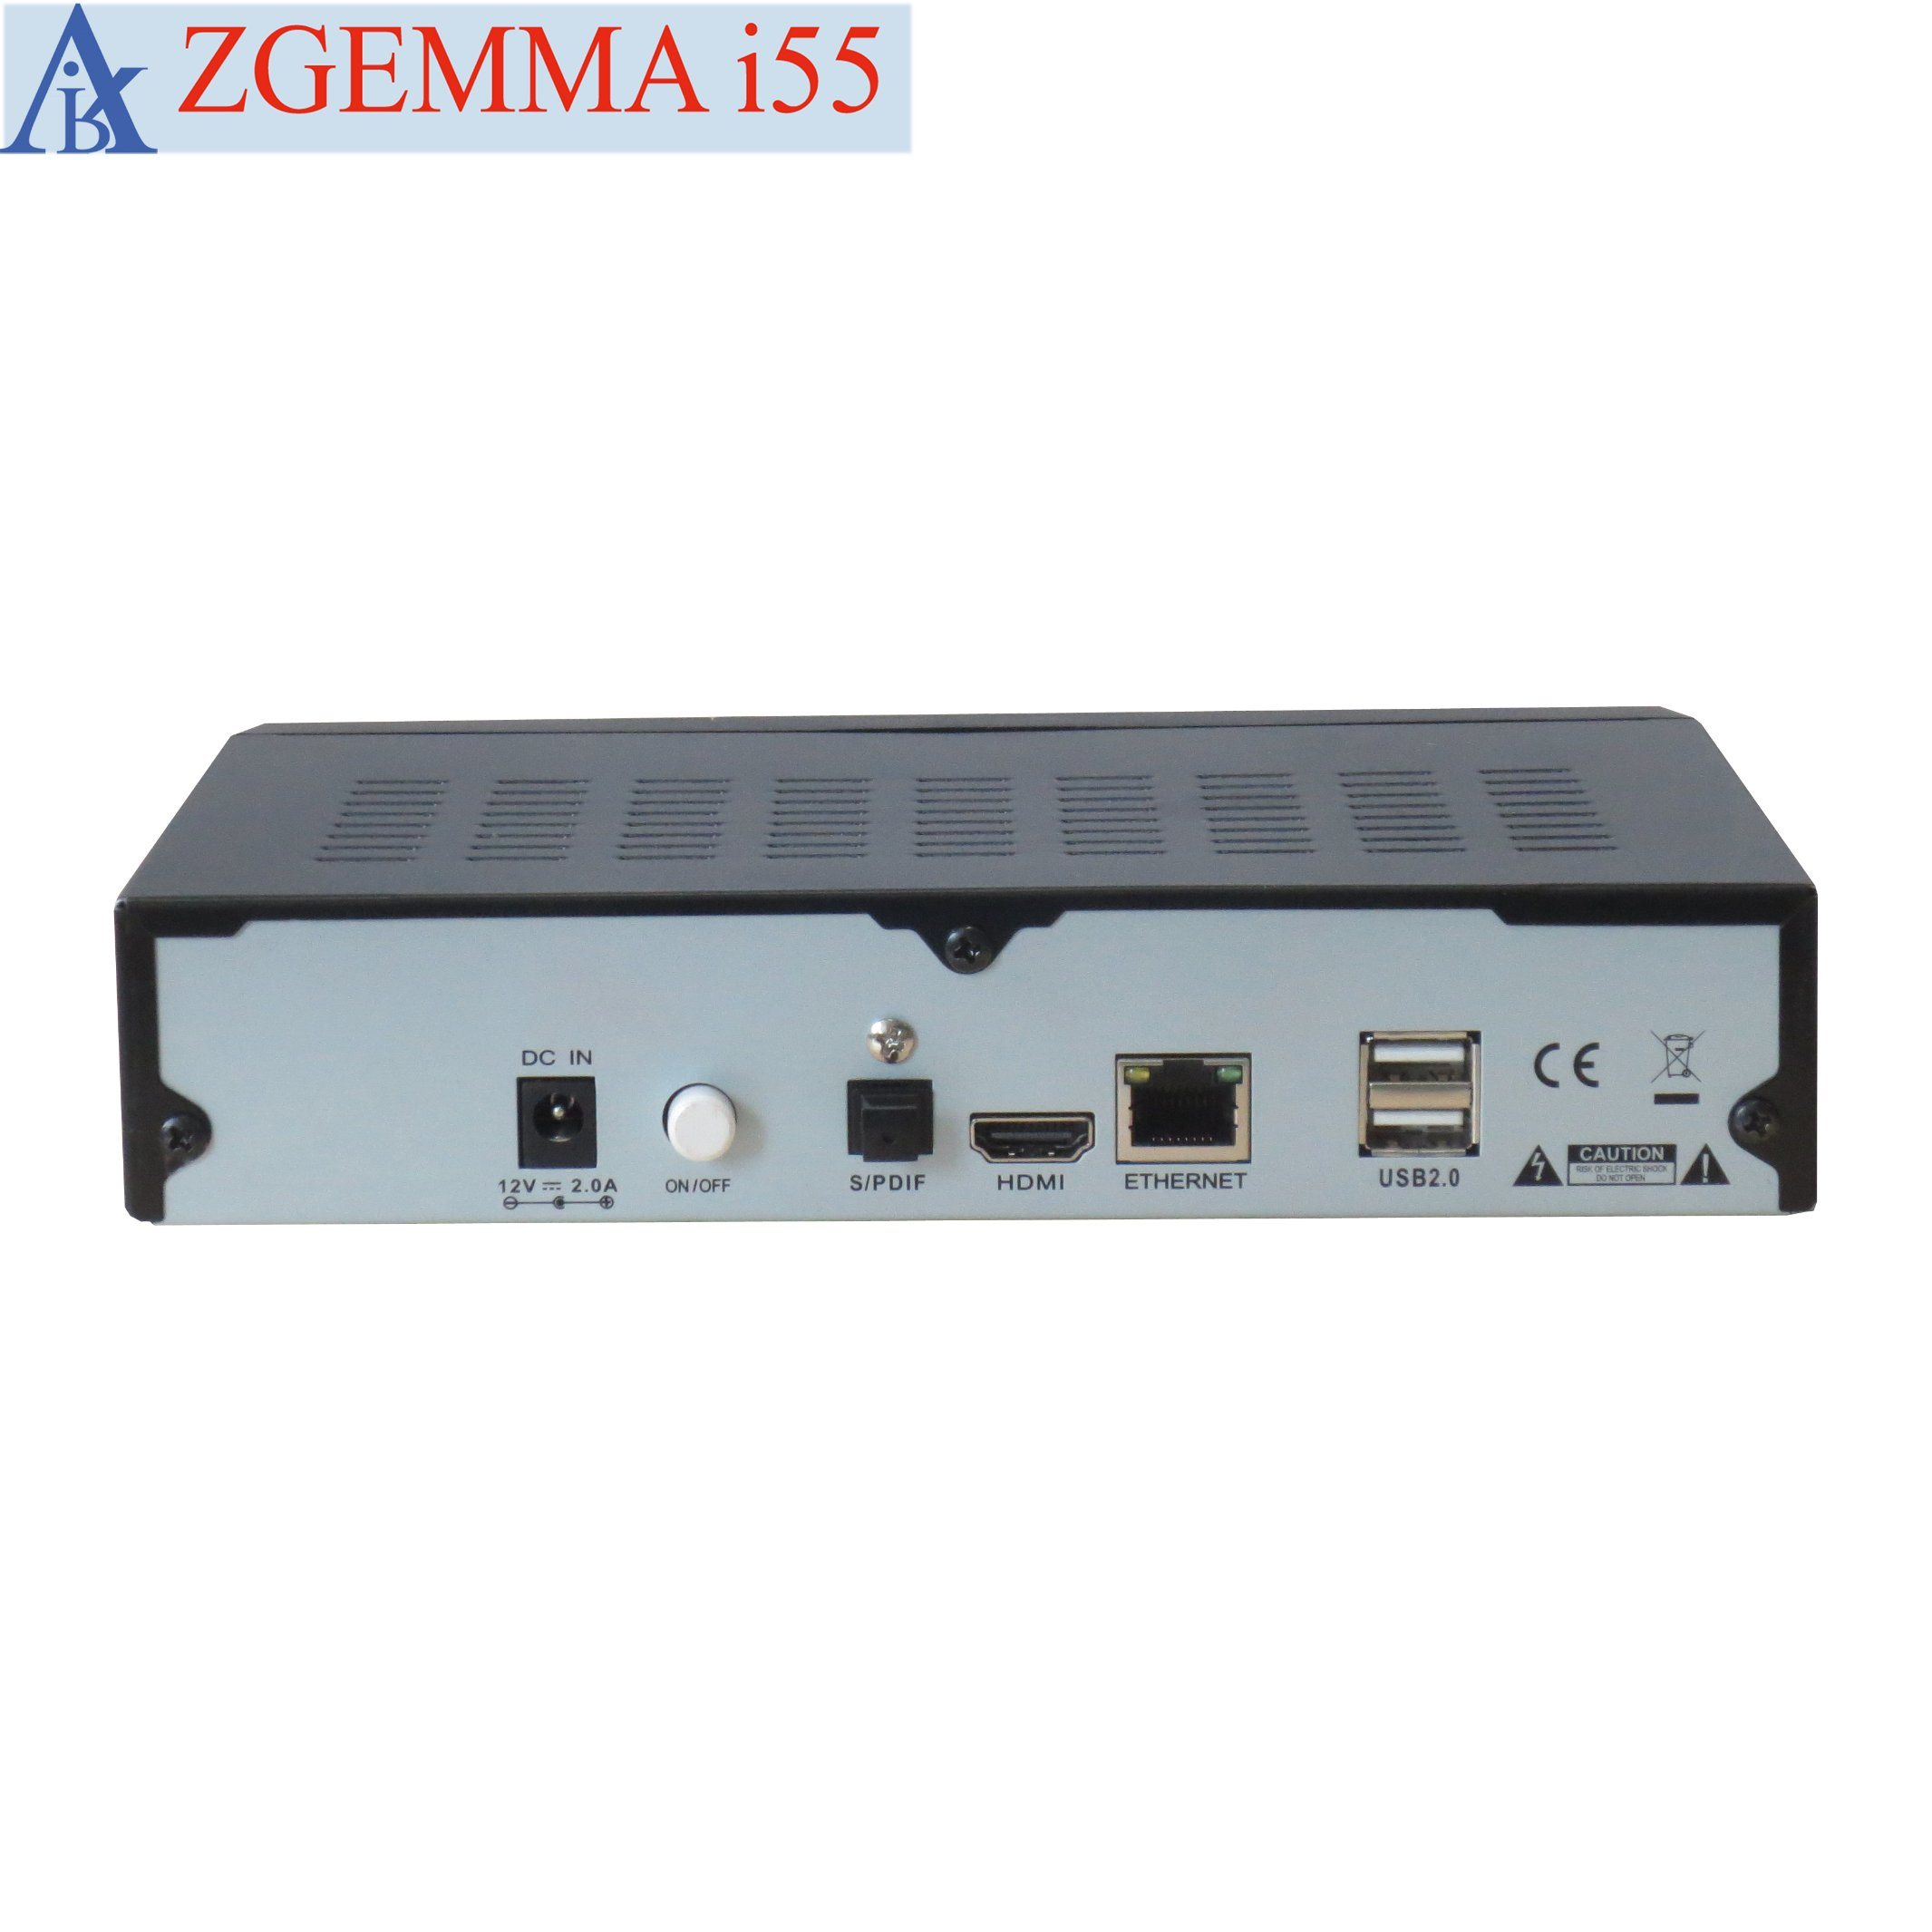 China Internet TV Box Linux IPTV Zgemma I55 Photos & Pictures - Made ...